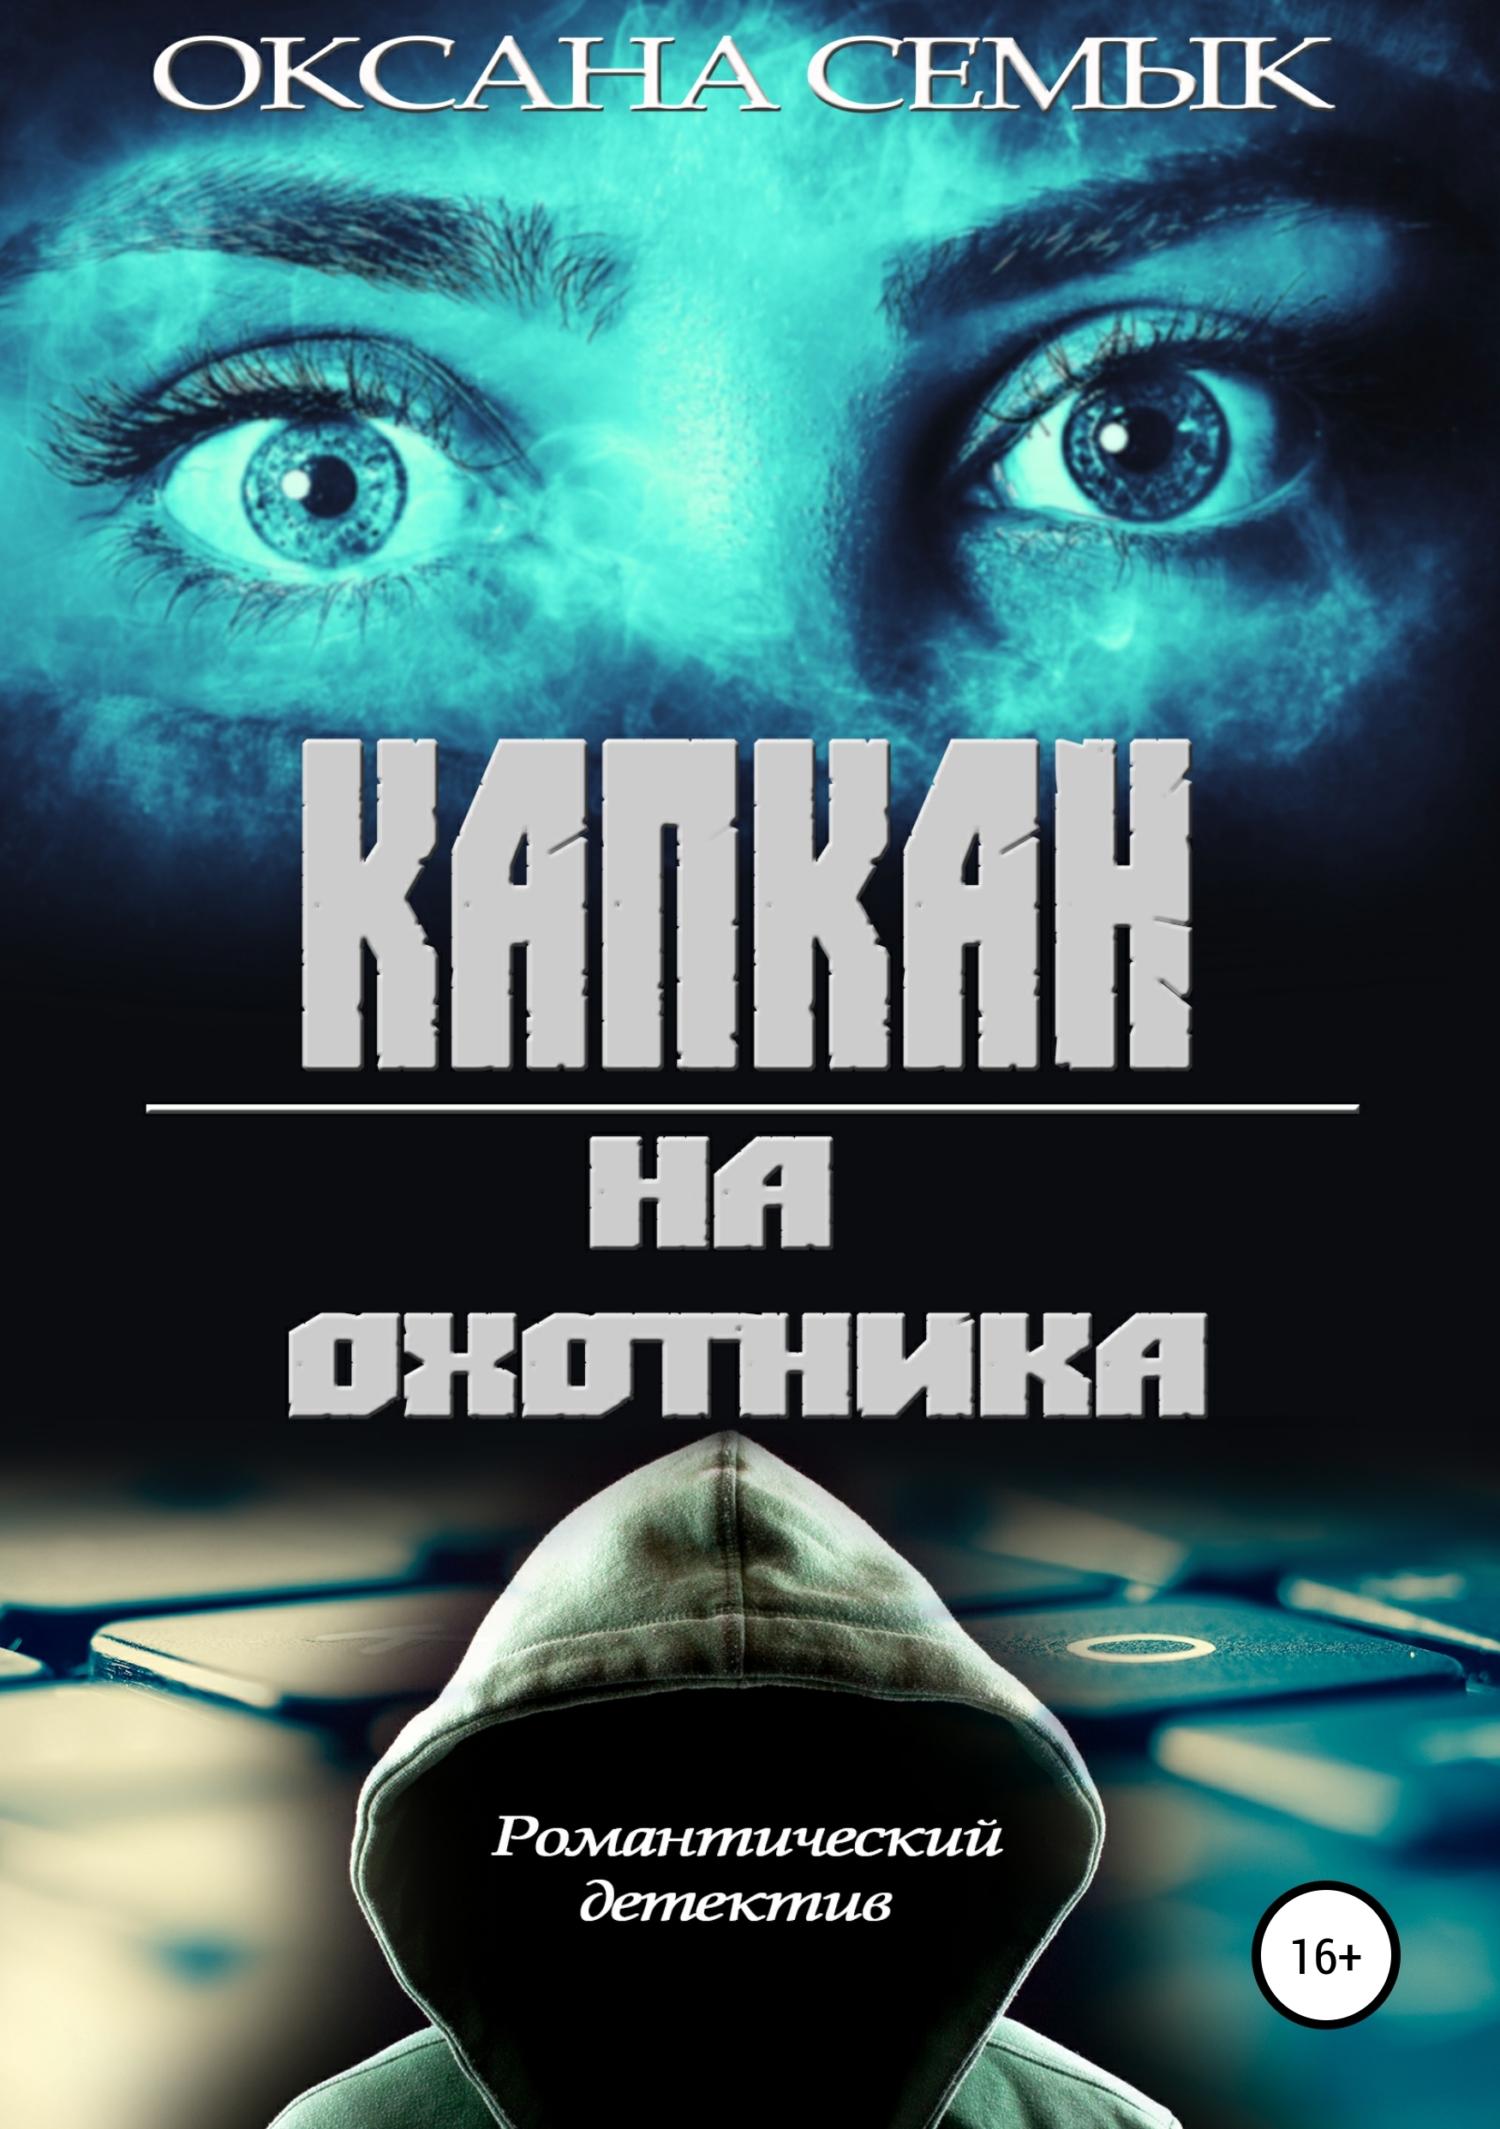 Оксана Семык Капкан на охотника